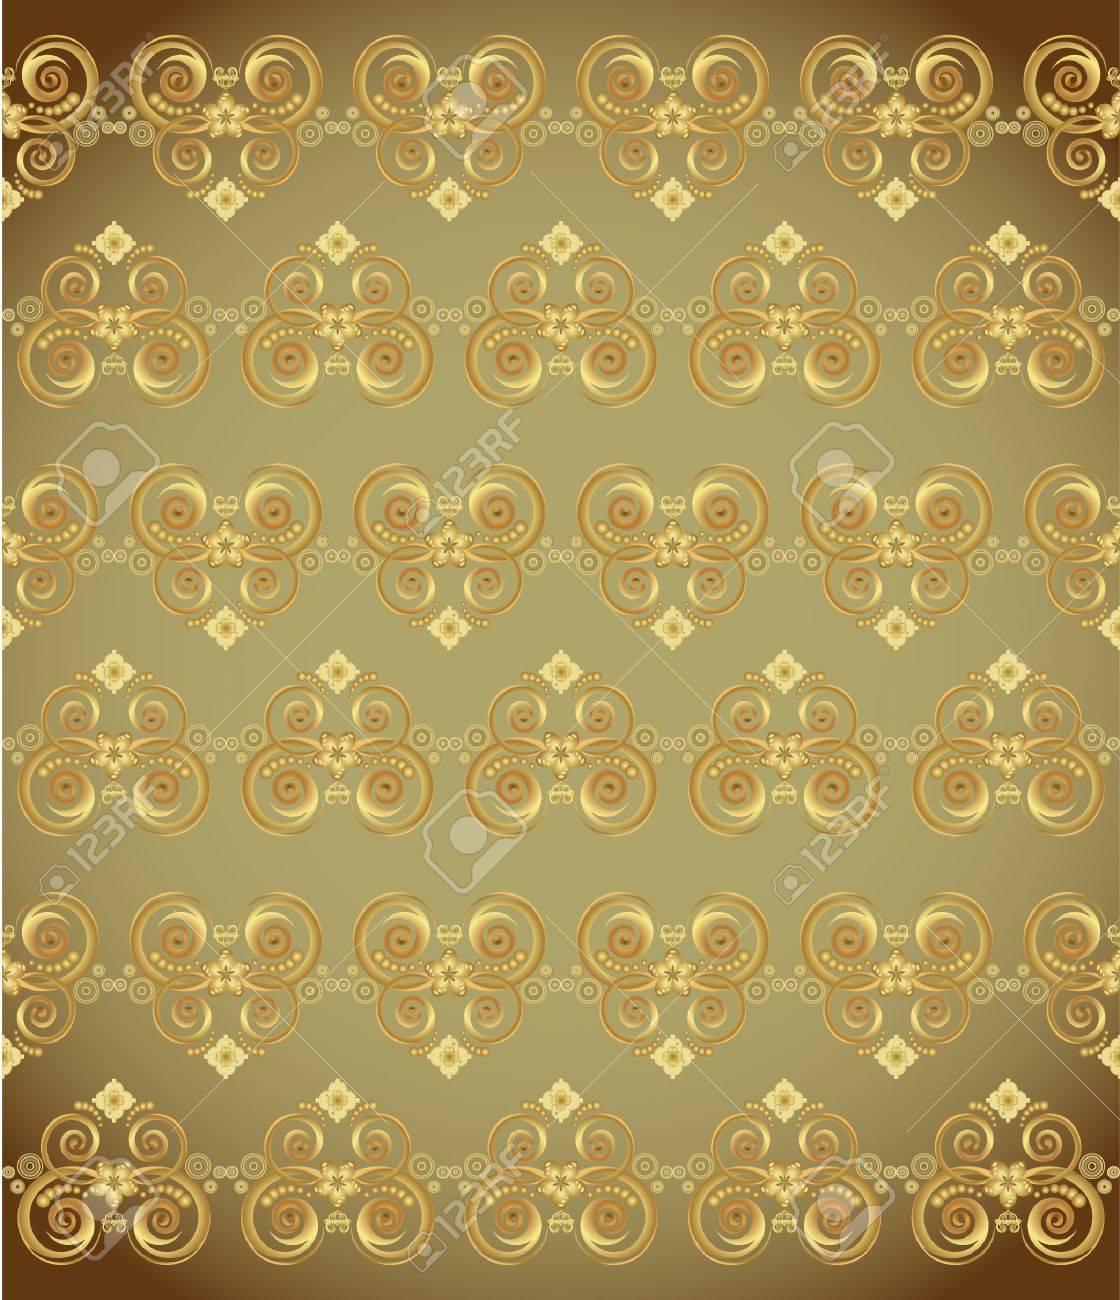 golden wallpaper with a pattern - seamless texture Stock Vector - 10119041